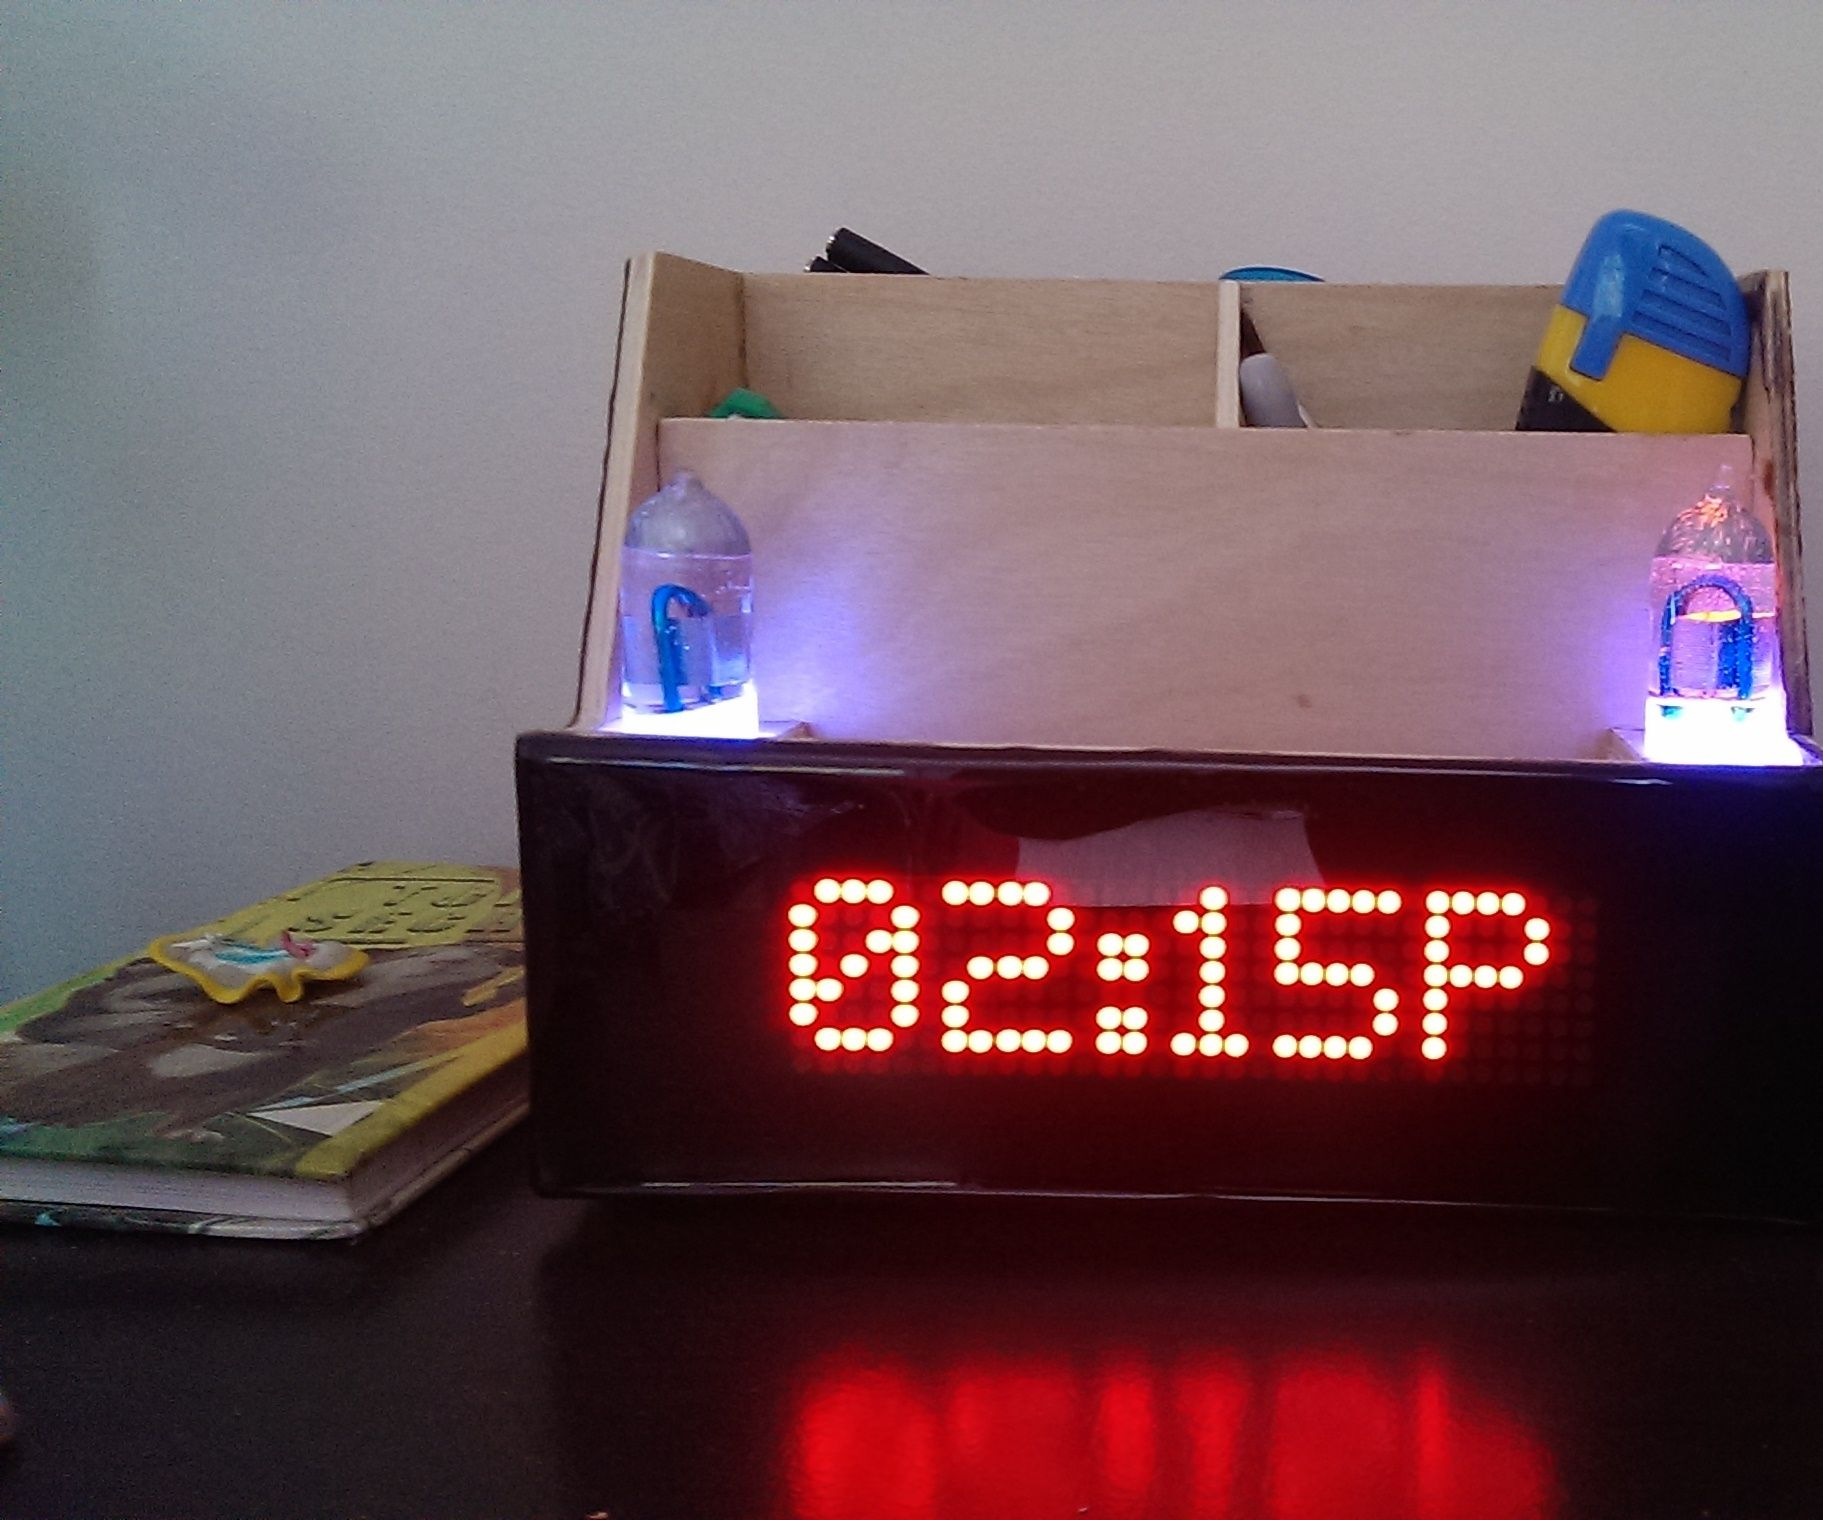 Desk Organizer With LED Matrix Clock and Bluetooth